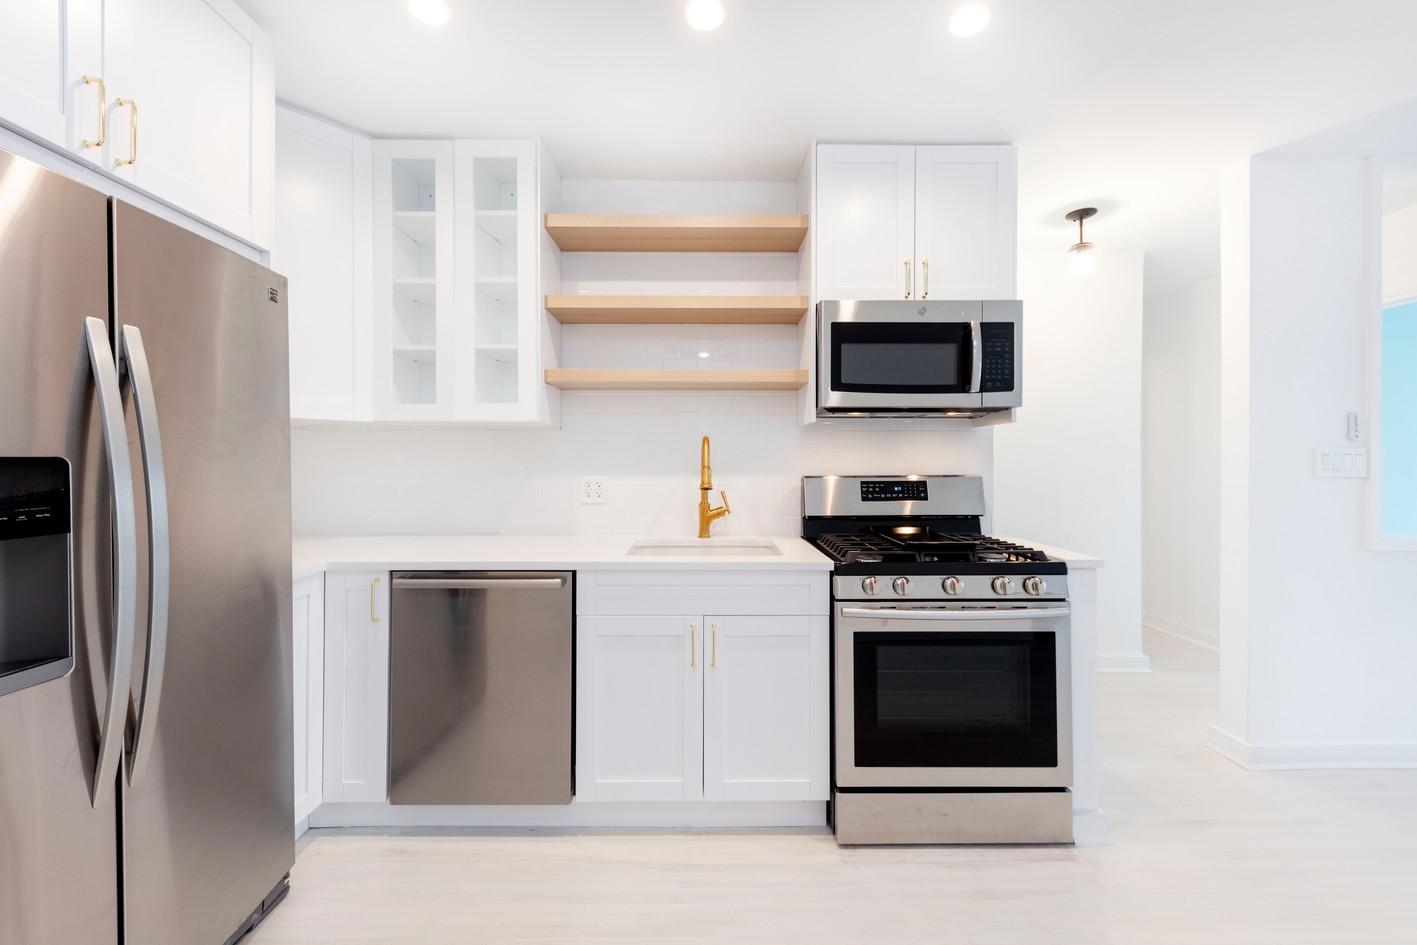 243-MacDonald-4s-Kitchen1.jpg